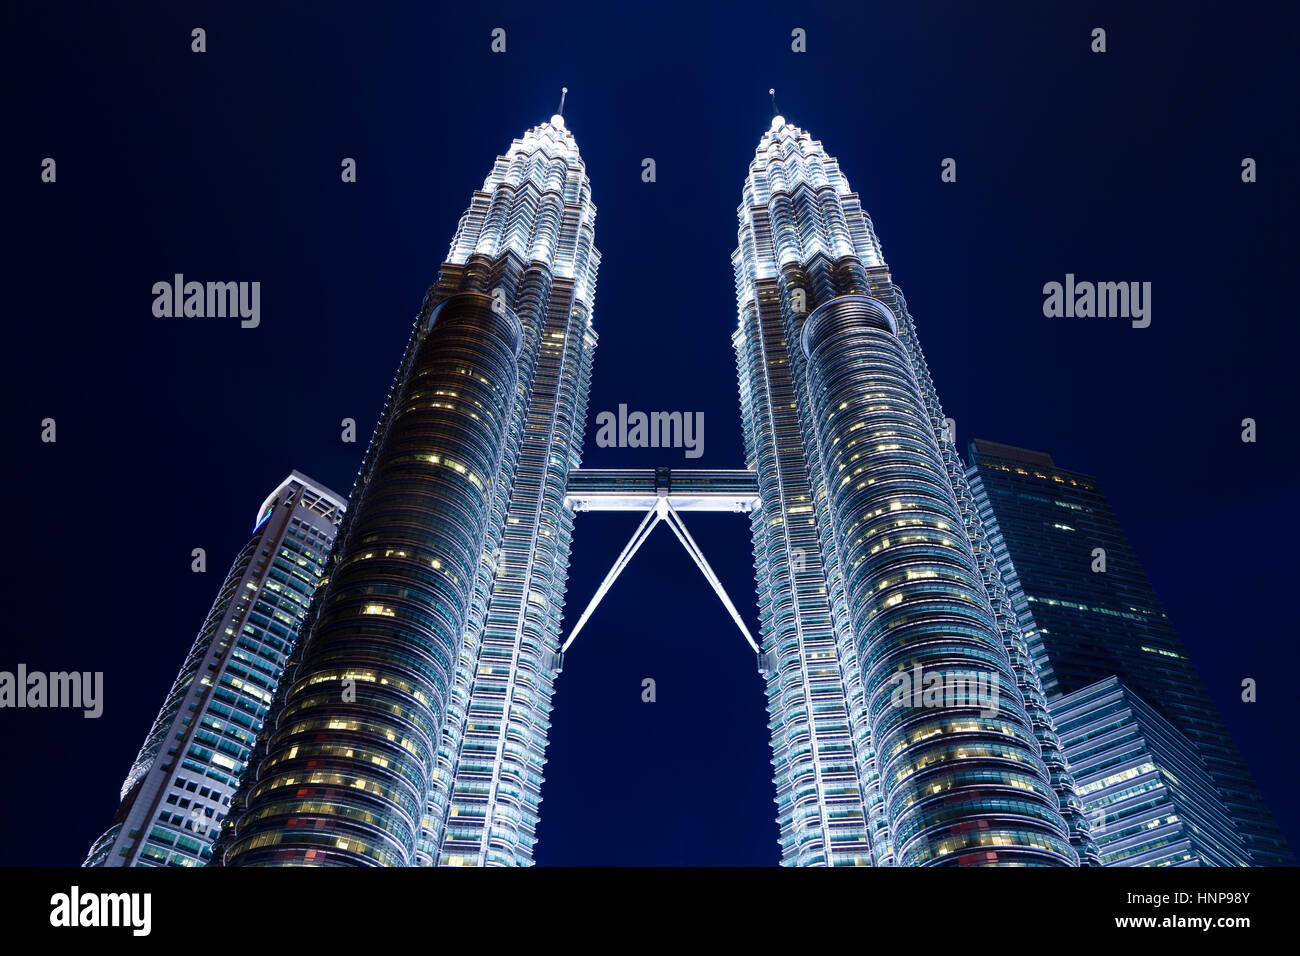 Les Tours Petronas de nuit, Kuala Lumpur, Malaisie Photo Stock